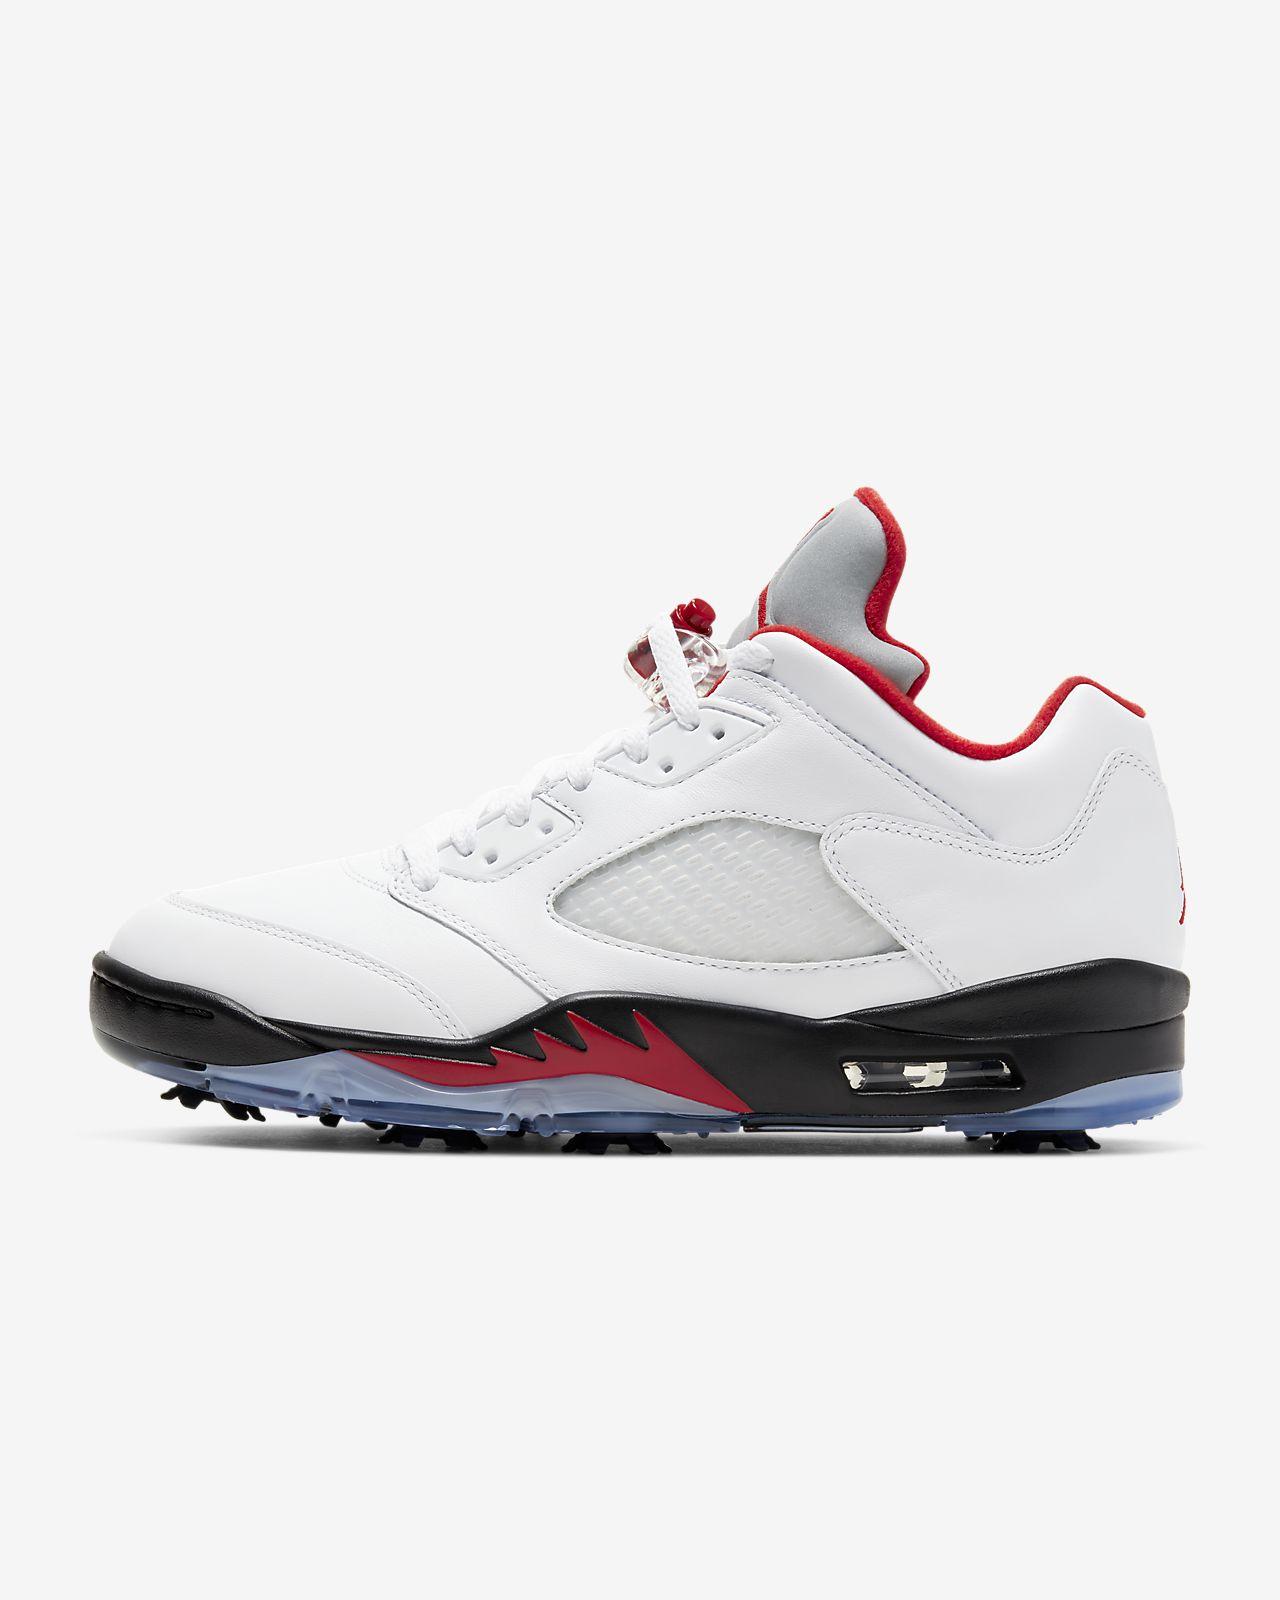 Calzado de golf Air Jordan V Low